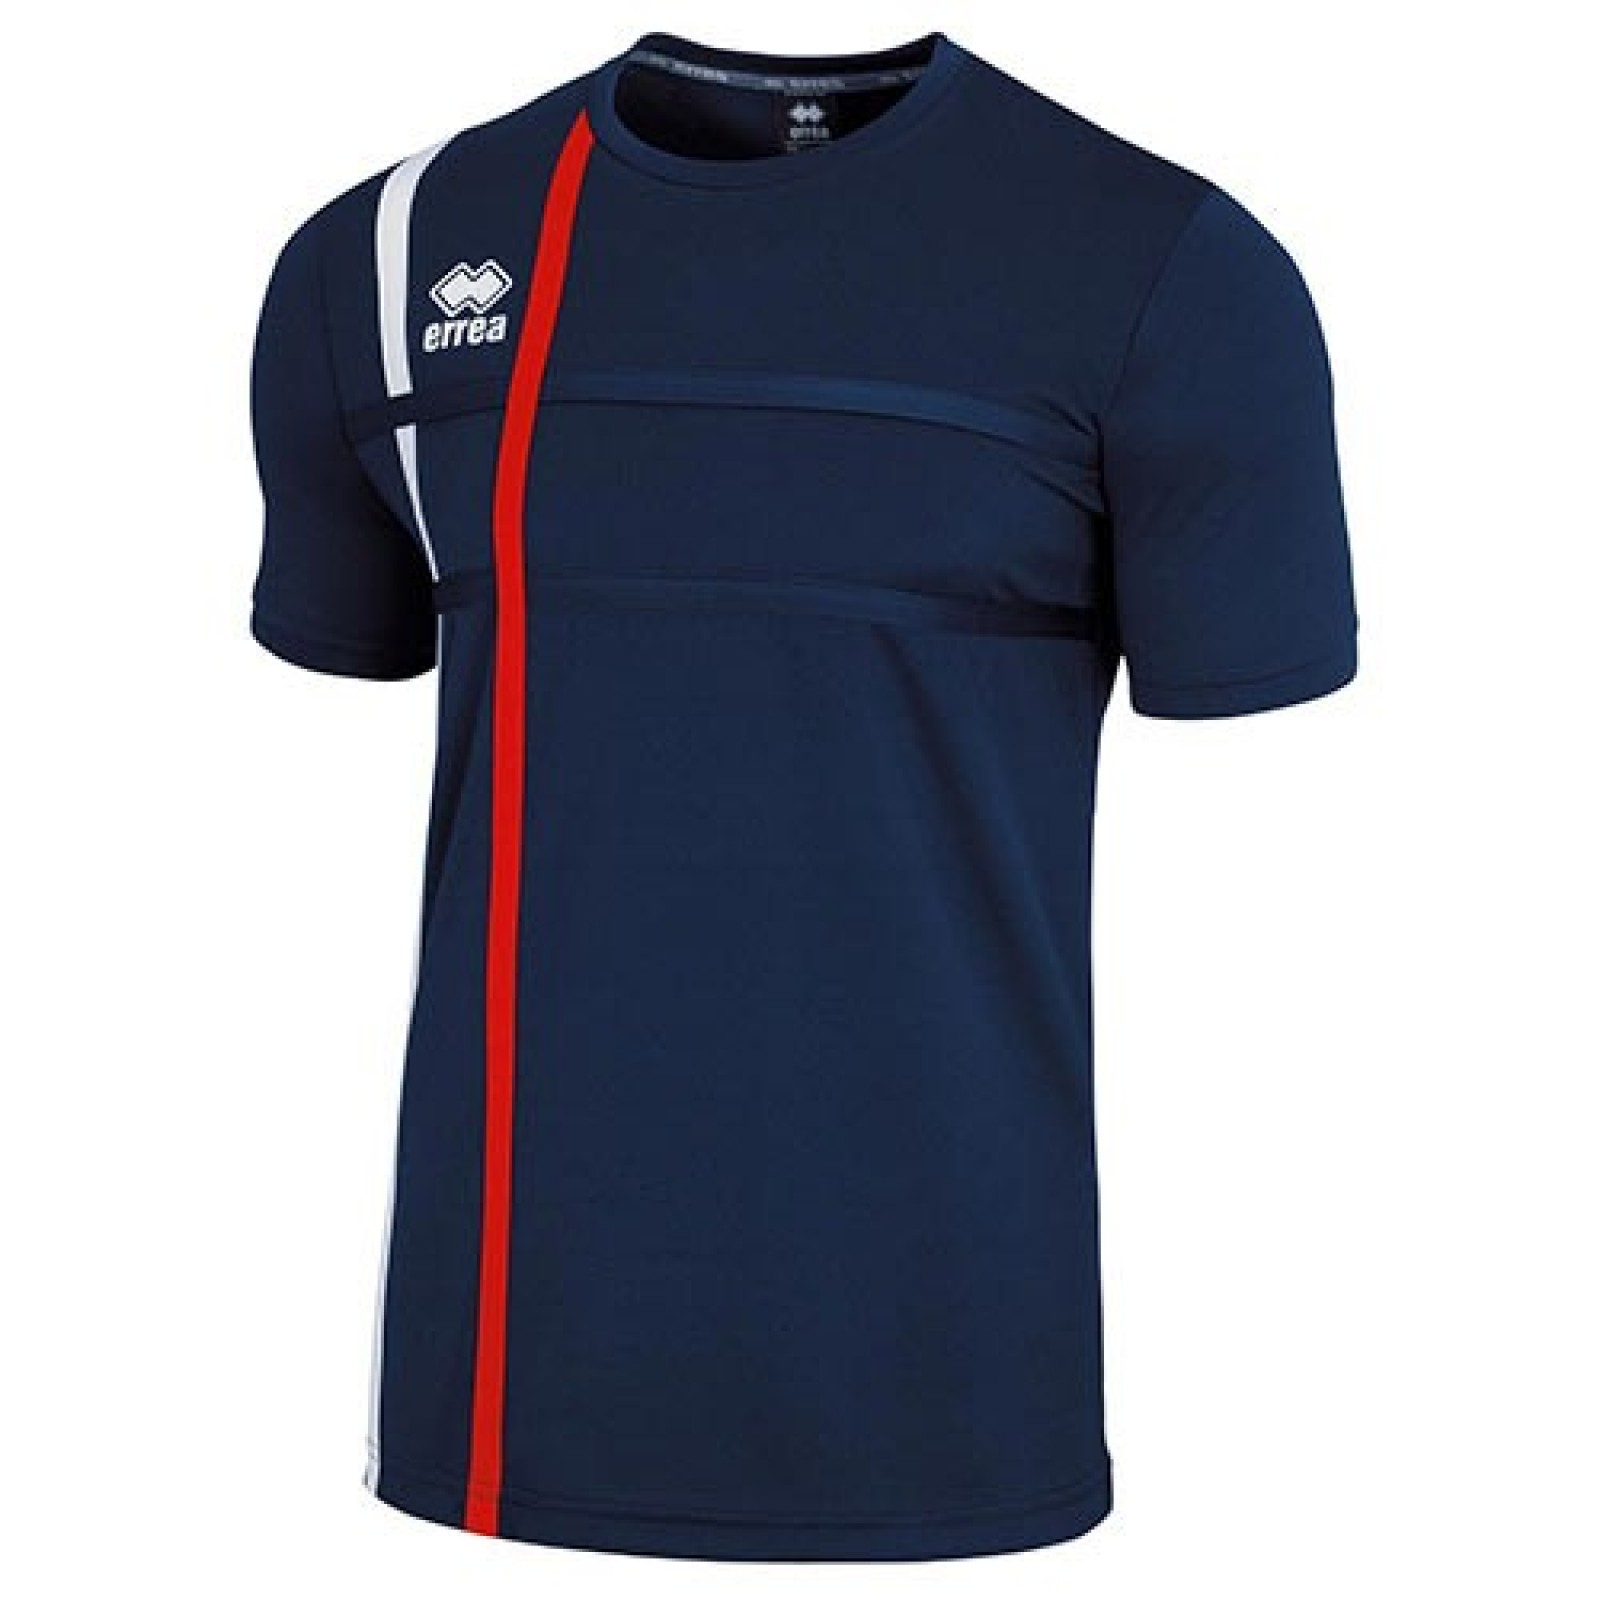 Errea Mateus Short Sleeve Shirt